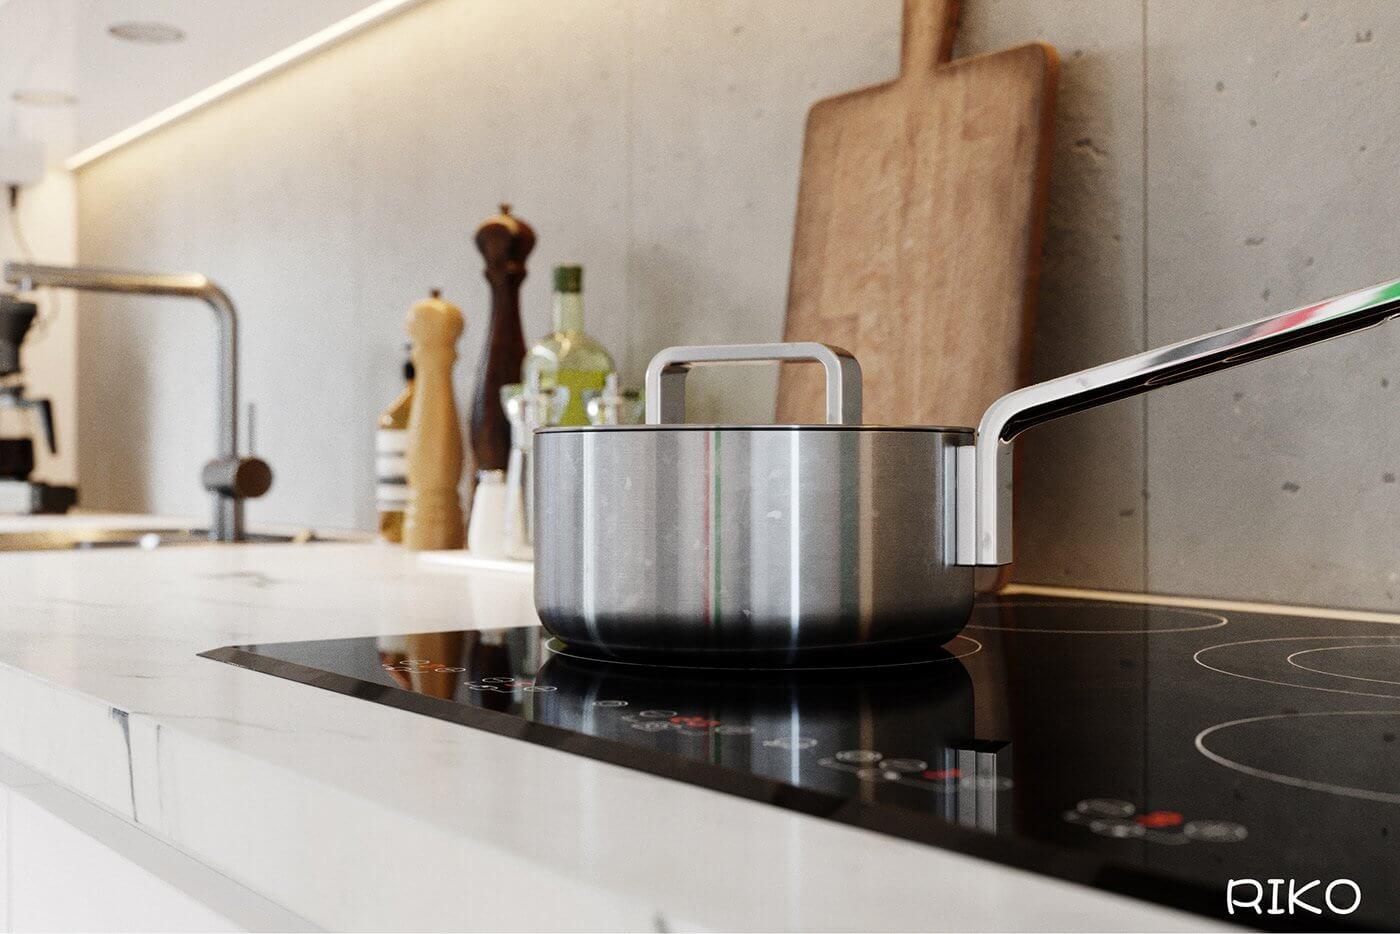 White kitchen design accessoires cooking pot - cgi visualization